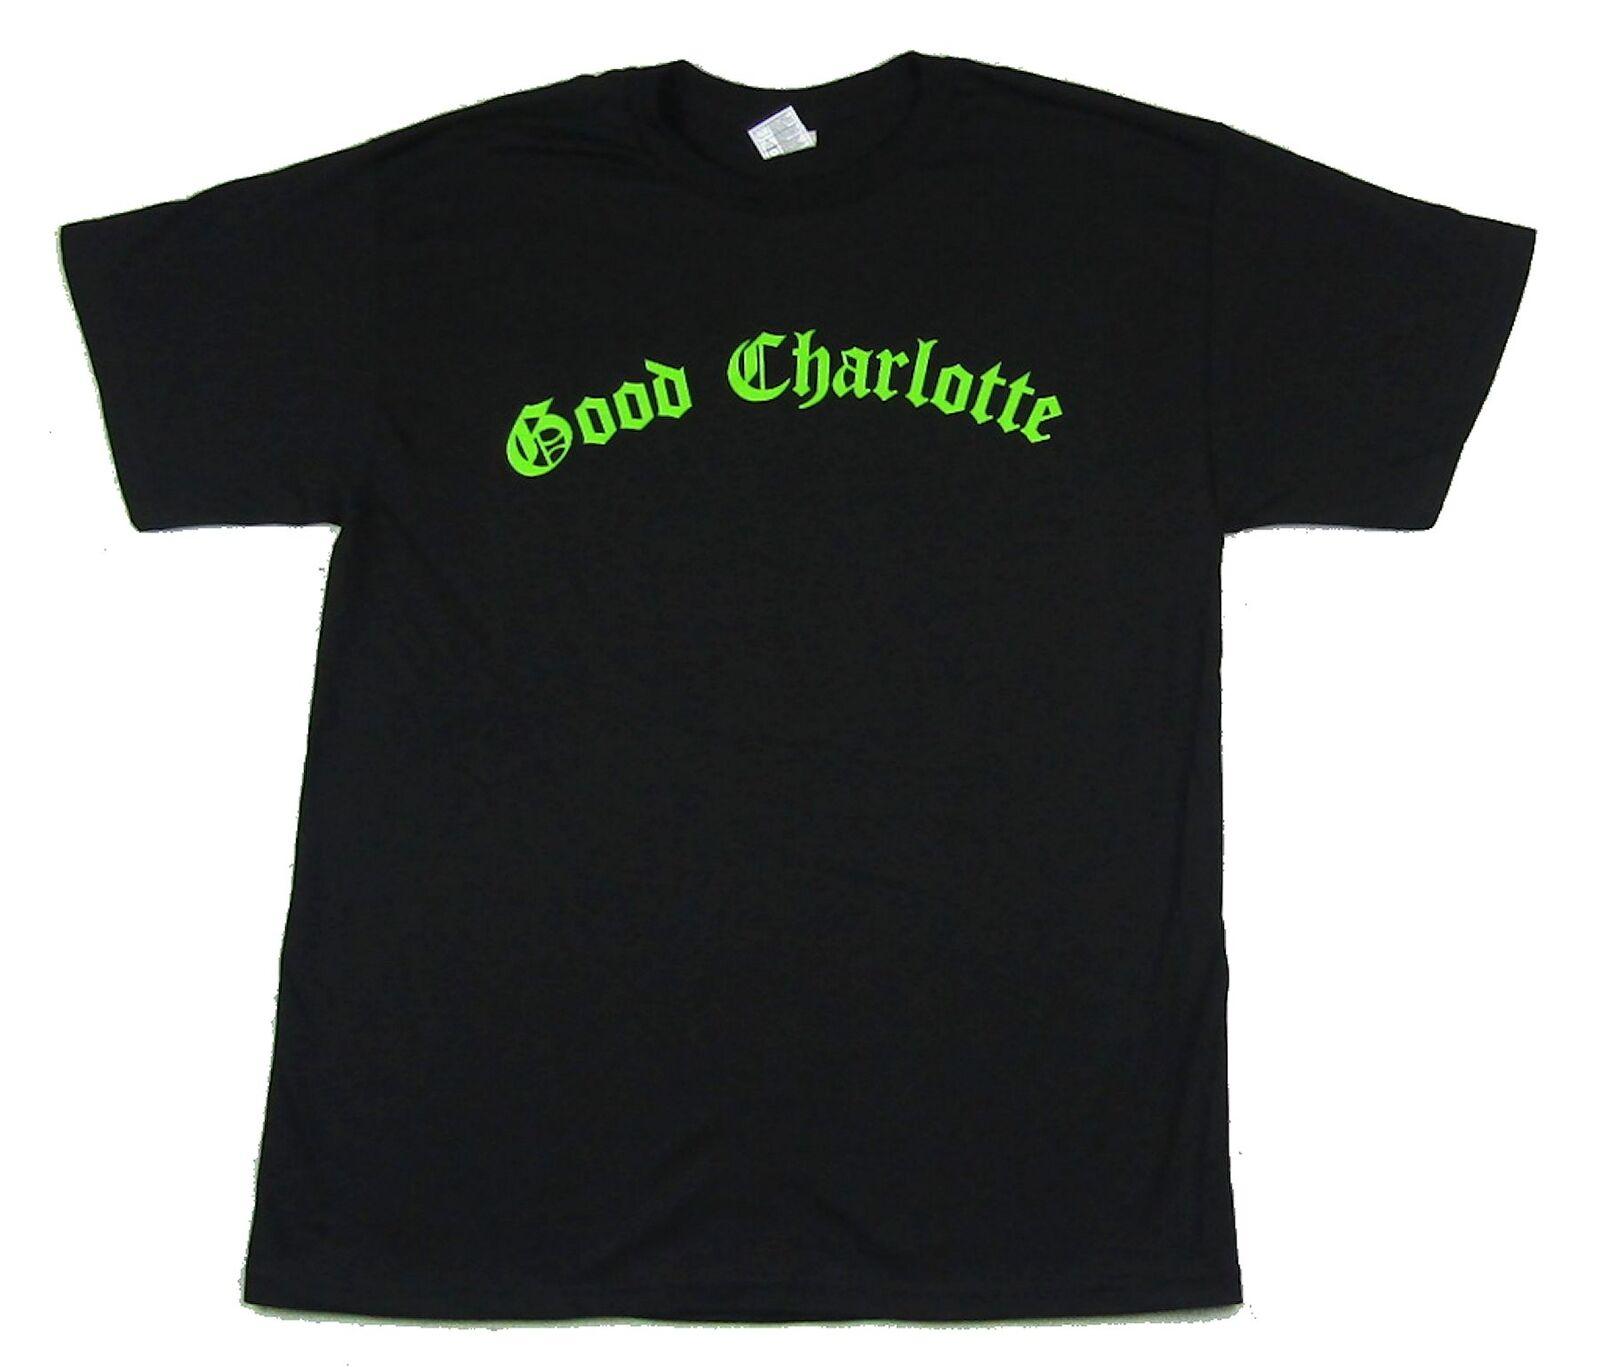 Good Charlotte Green Name Logo Black T Shirt New Official Band Merch